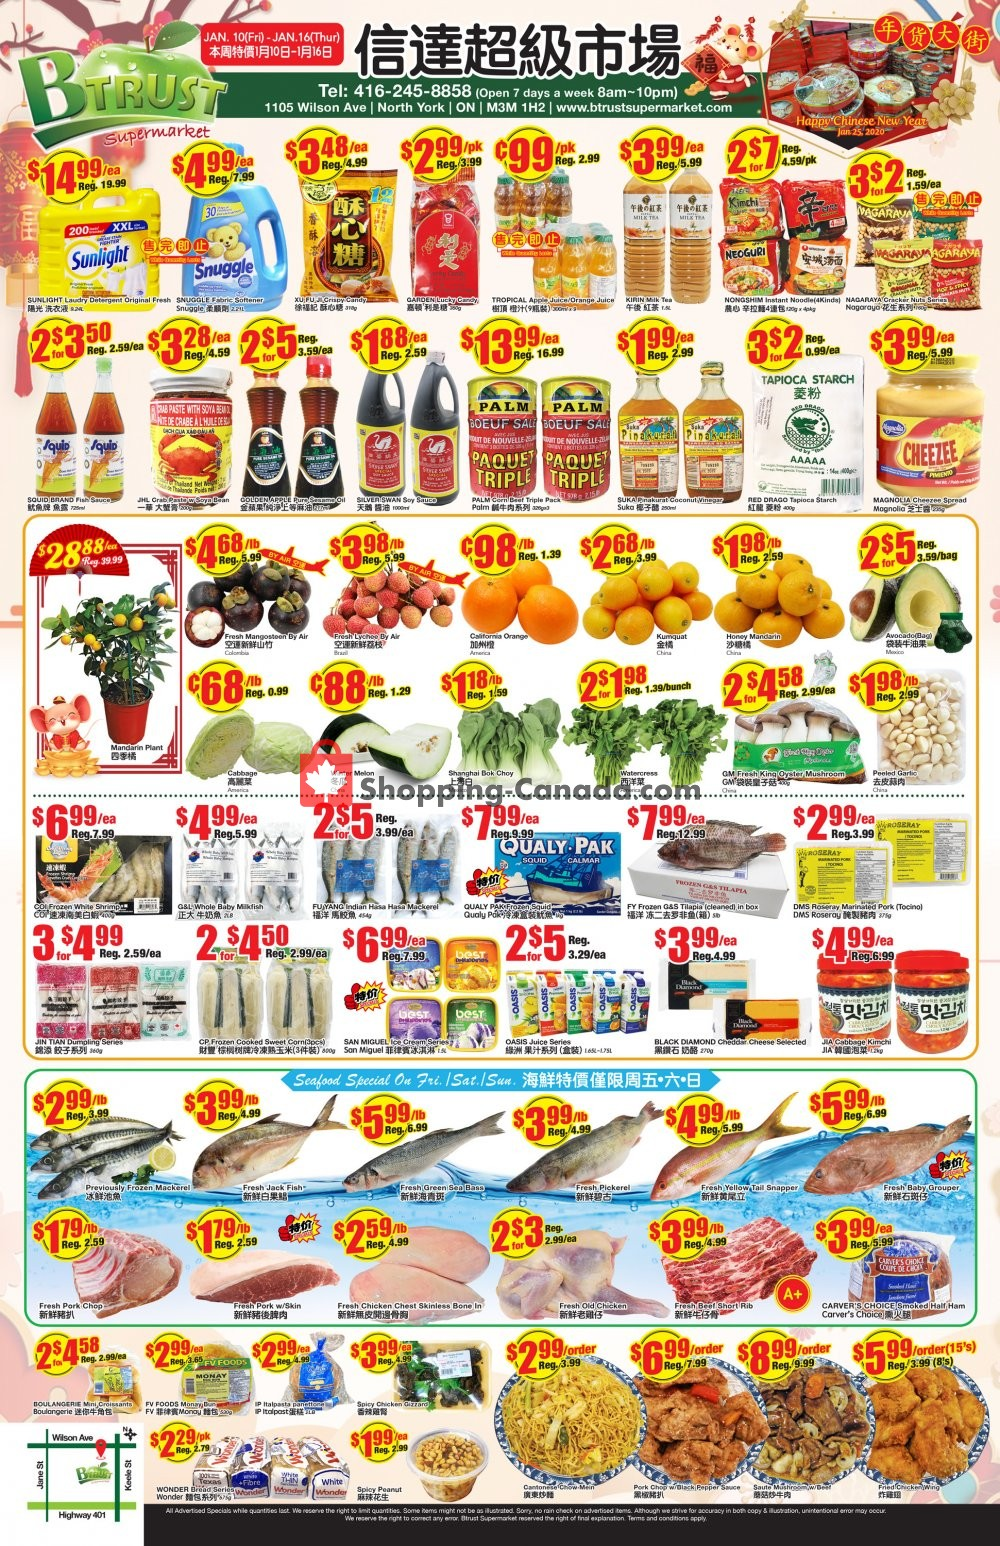 Flyer Btrust Supermarket Canada - from Friday January 10, 2020 to Thursday January 16, 2020